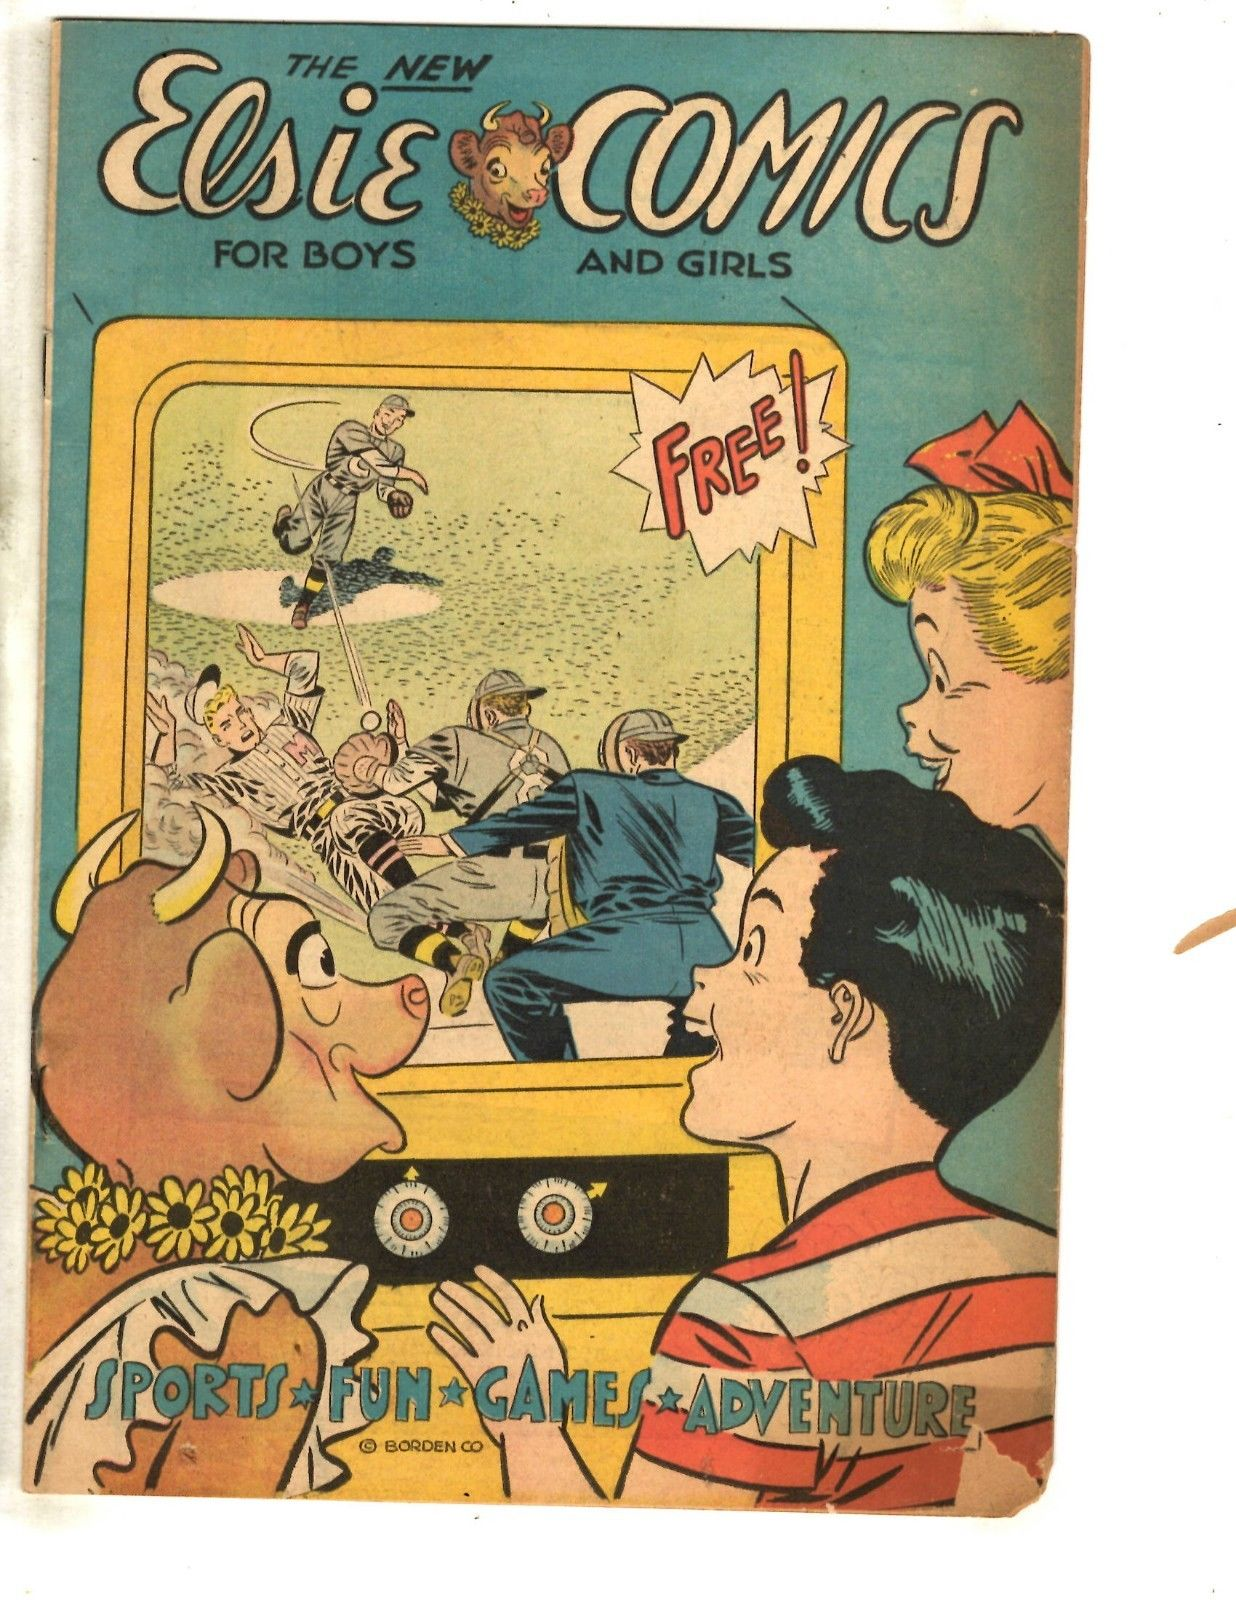 Elsie Comics For Boys /& Girls Free Giveaway Promo Comic Book Borden Sports JL17